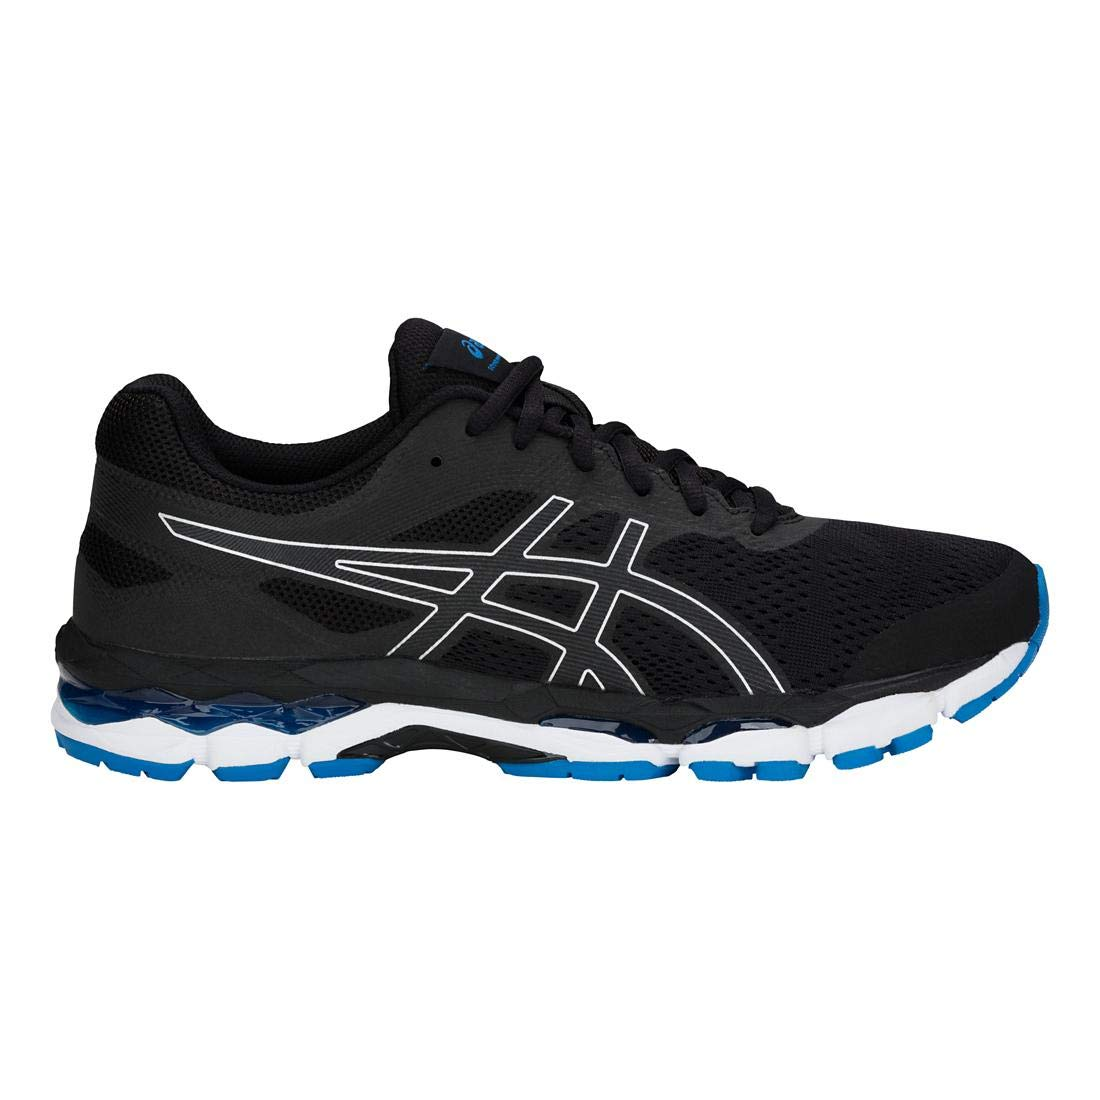 Black Silver ASICS Men's Gel-Superion 2 Running shoes